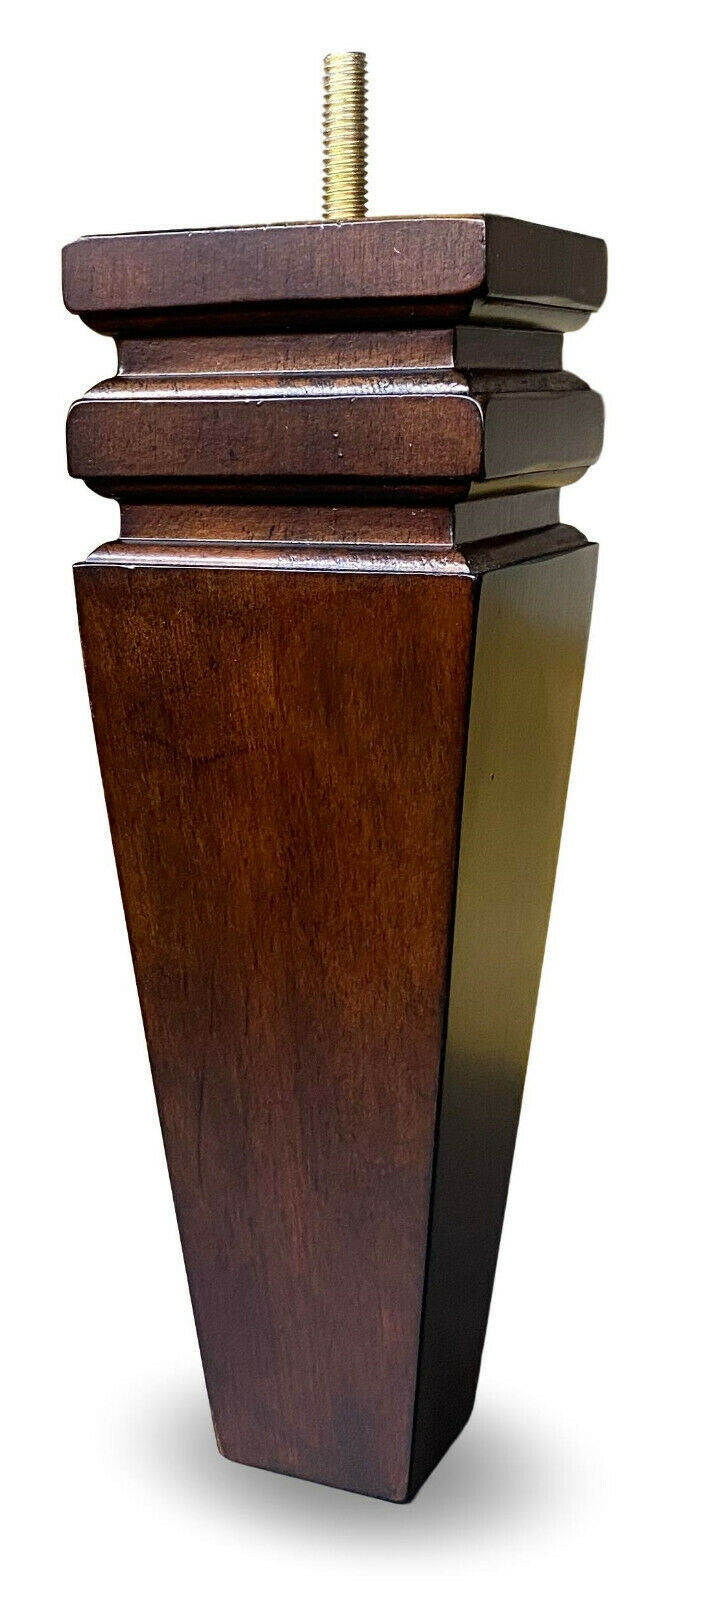 8″ Walnut Finish Square Tapered Sofa Furniture Legs – Set of 4 Furniture